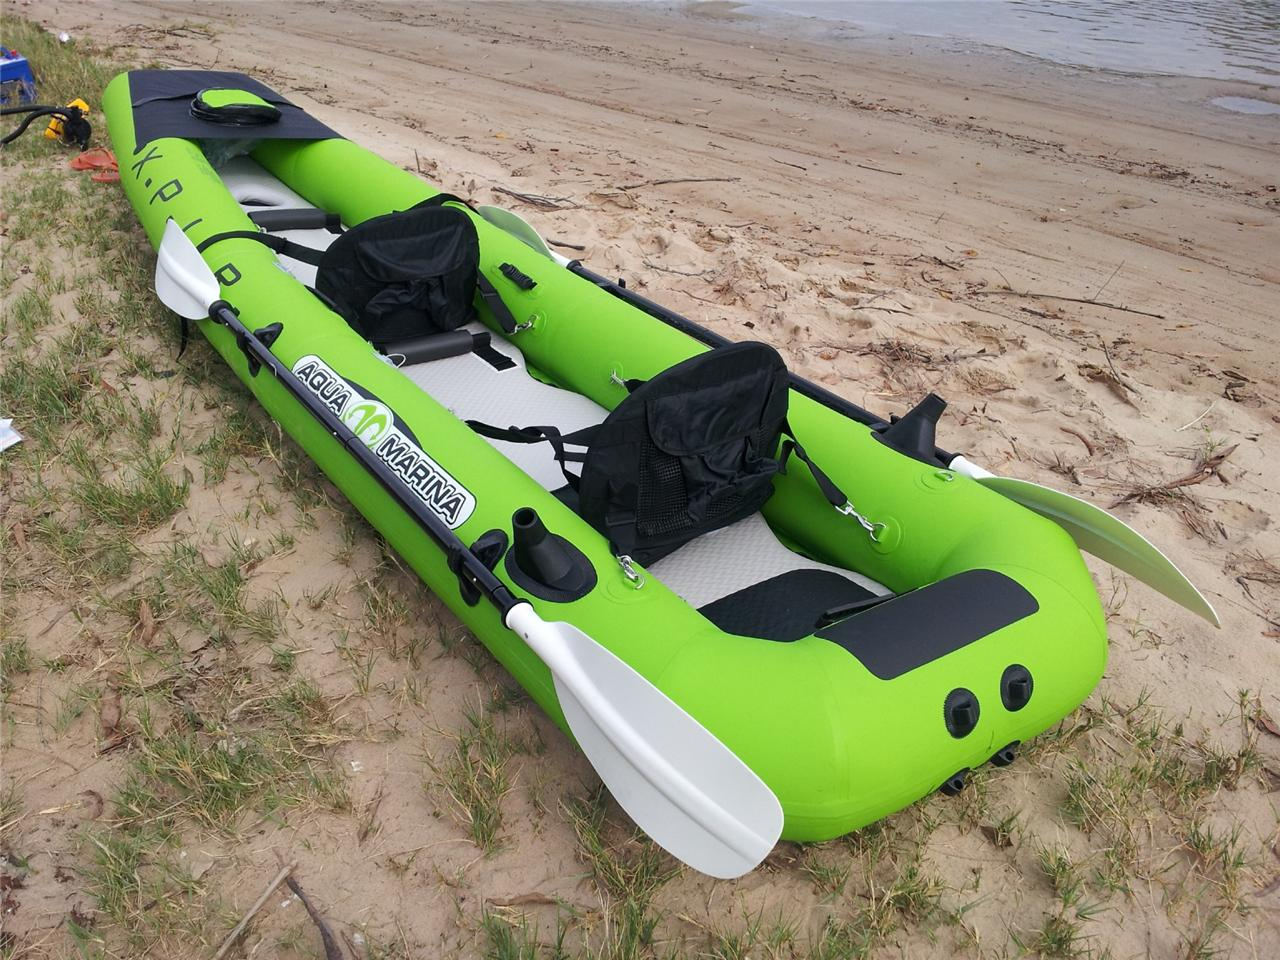 Fishing kayak canoe boat brand new inflatable 2 person for 2 seater fishing kayak